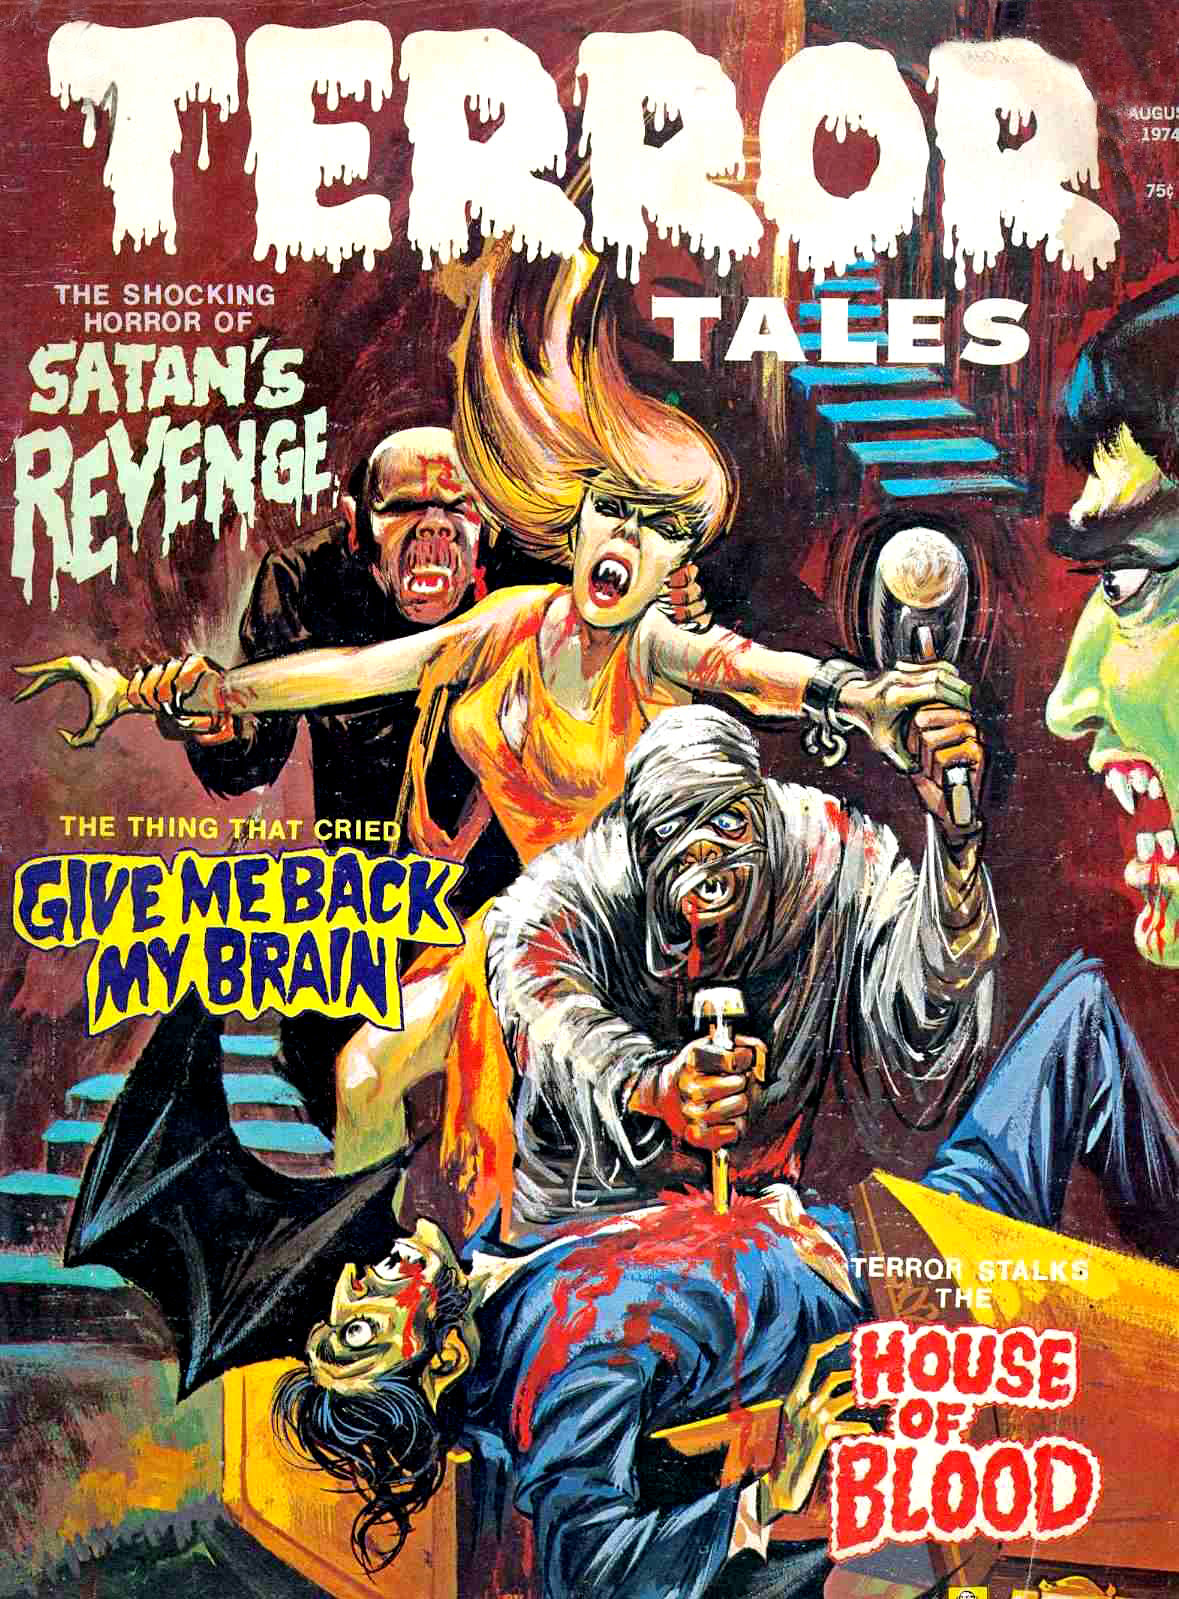 Terror Tales Vol. 06 #4 (Eerie Publications, 1974)